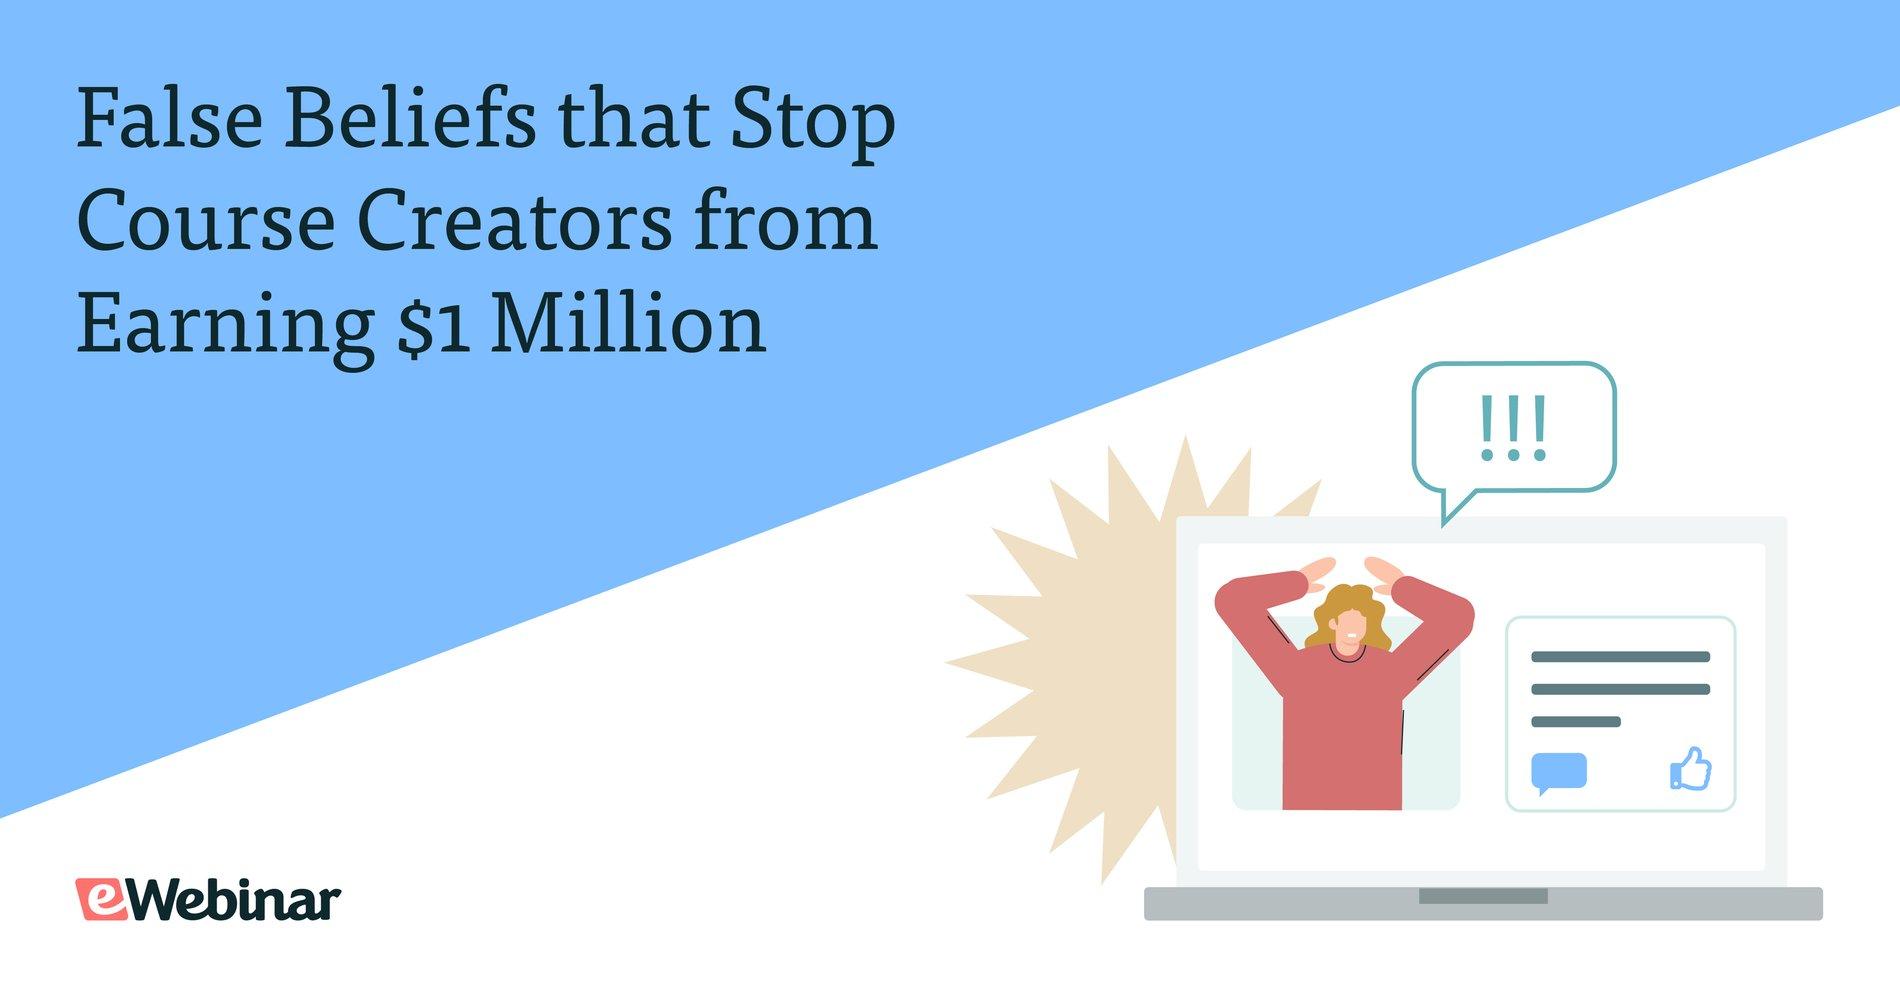 False Beliefs that Stop Course Creators from Earning $1 Million